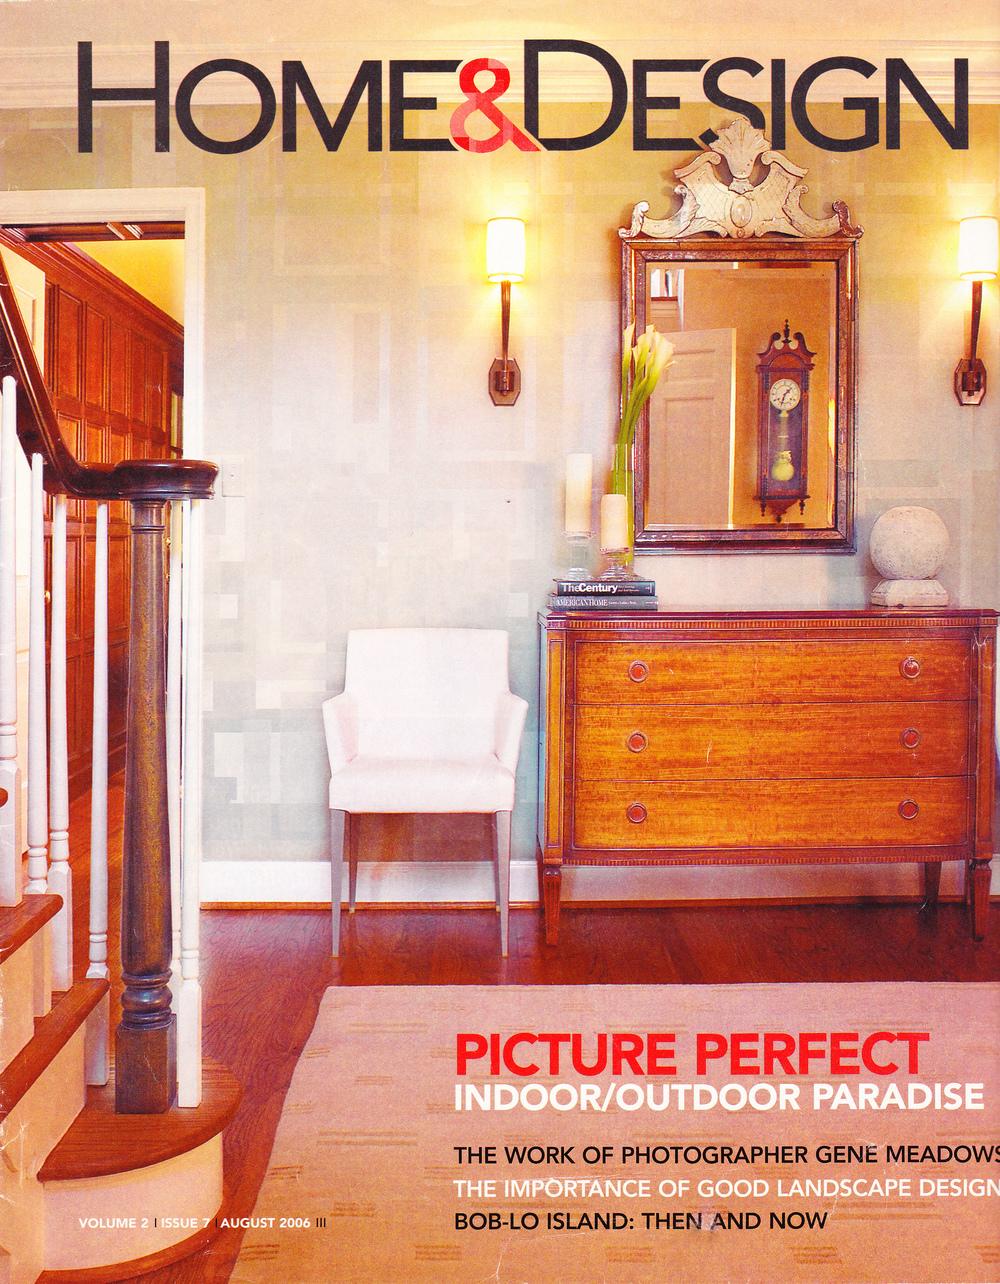 Home & Design.jpg